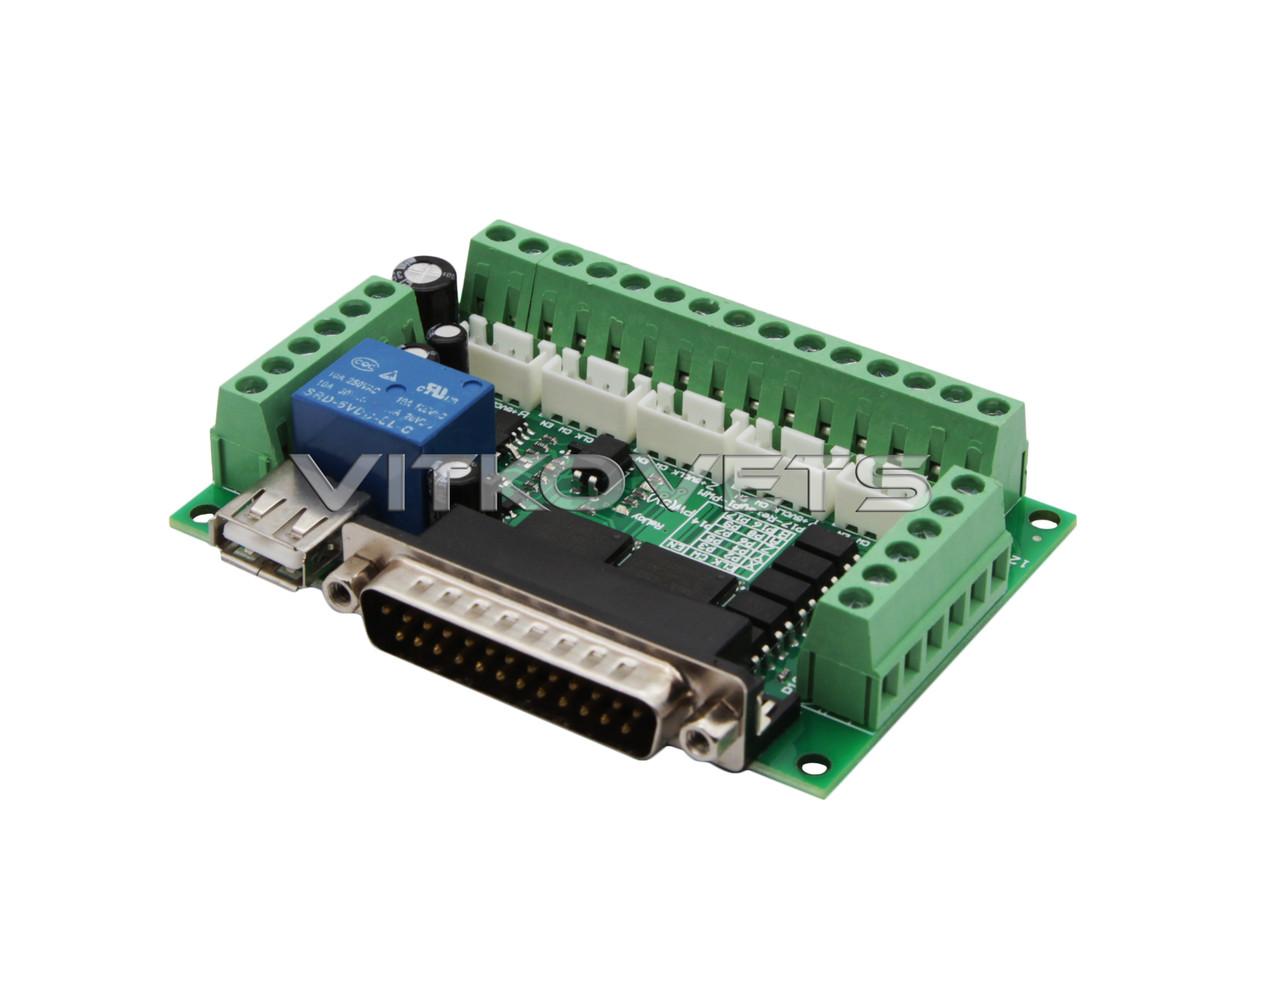 Интерфейсная плата LPT на 5 координат BL-MACH-V1.1 (без USB и LPT кабелей)